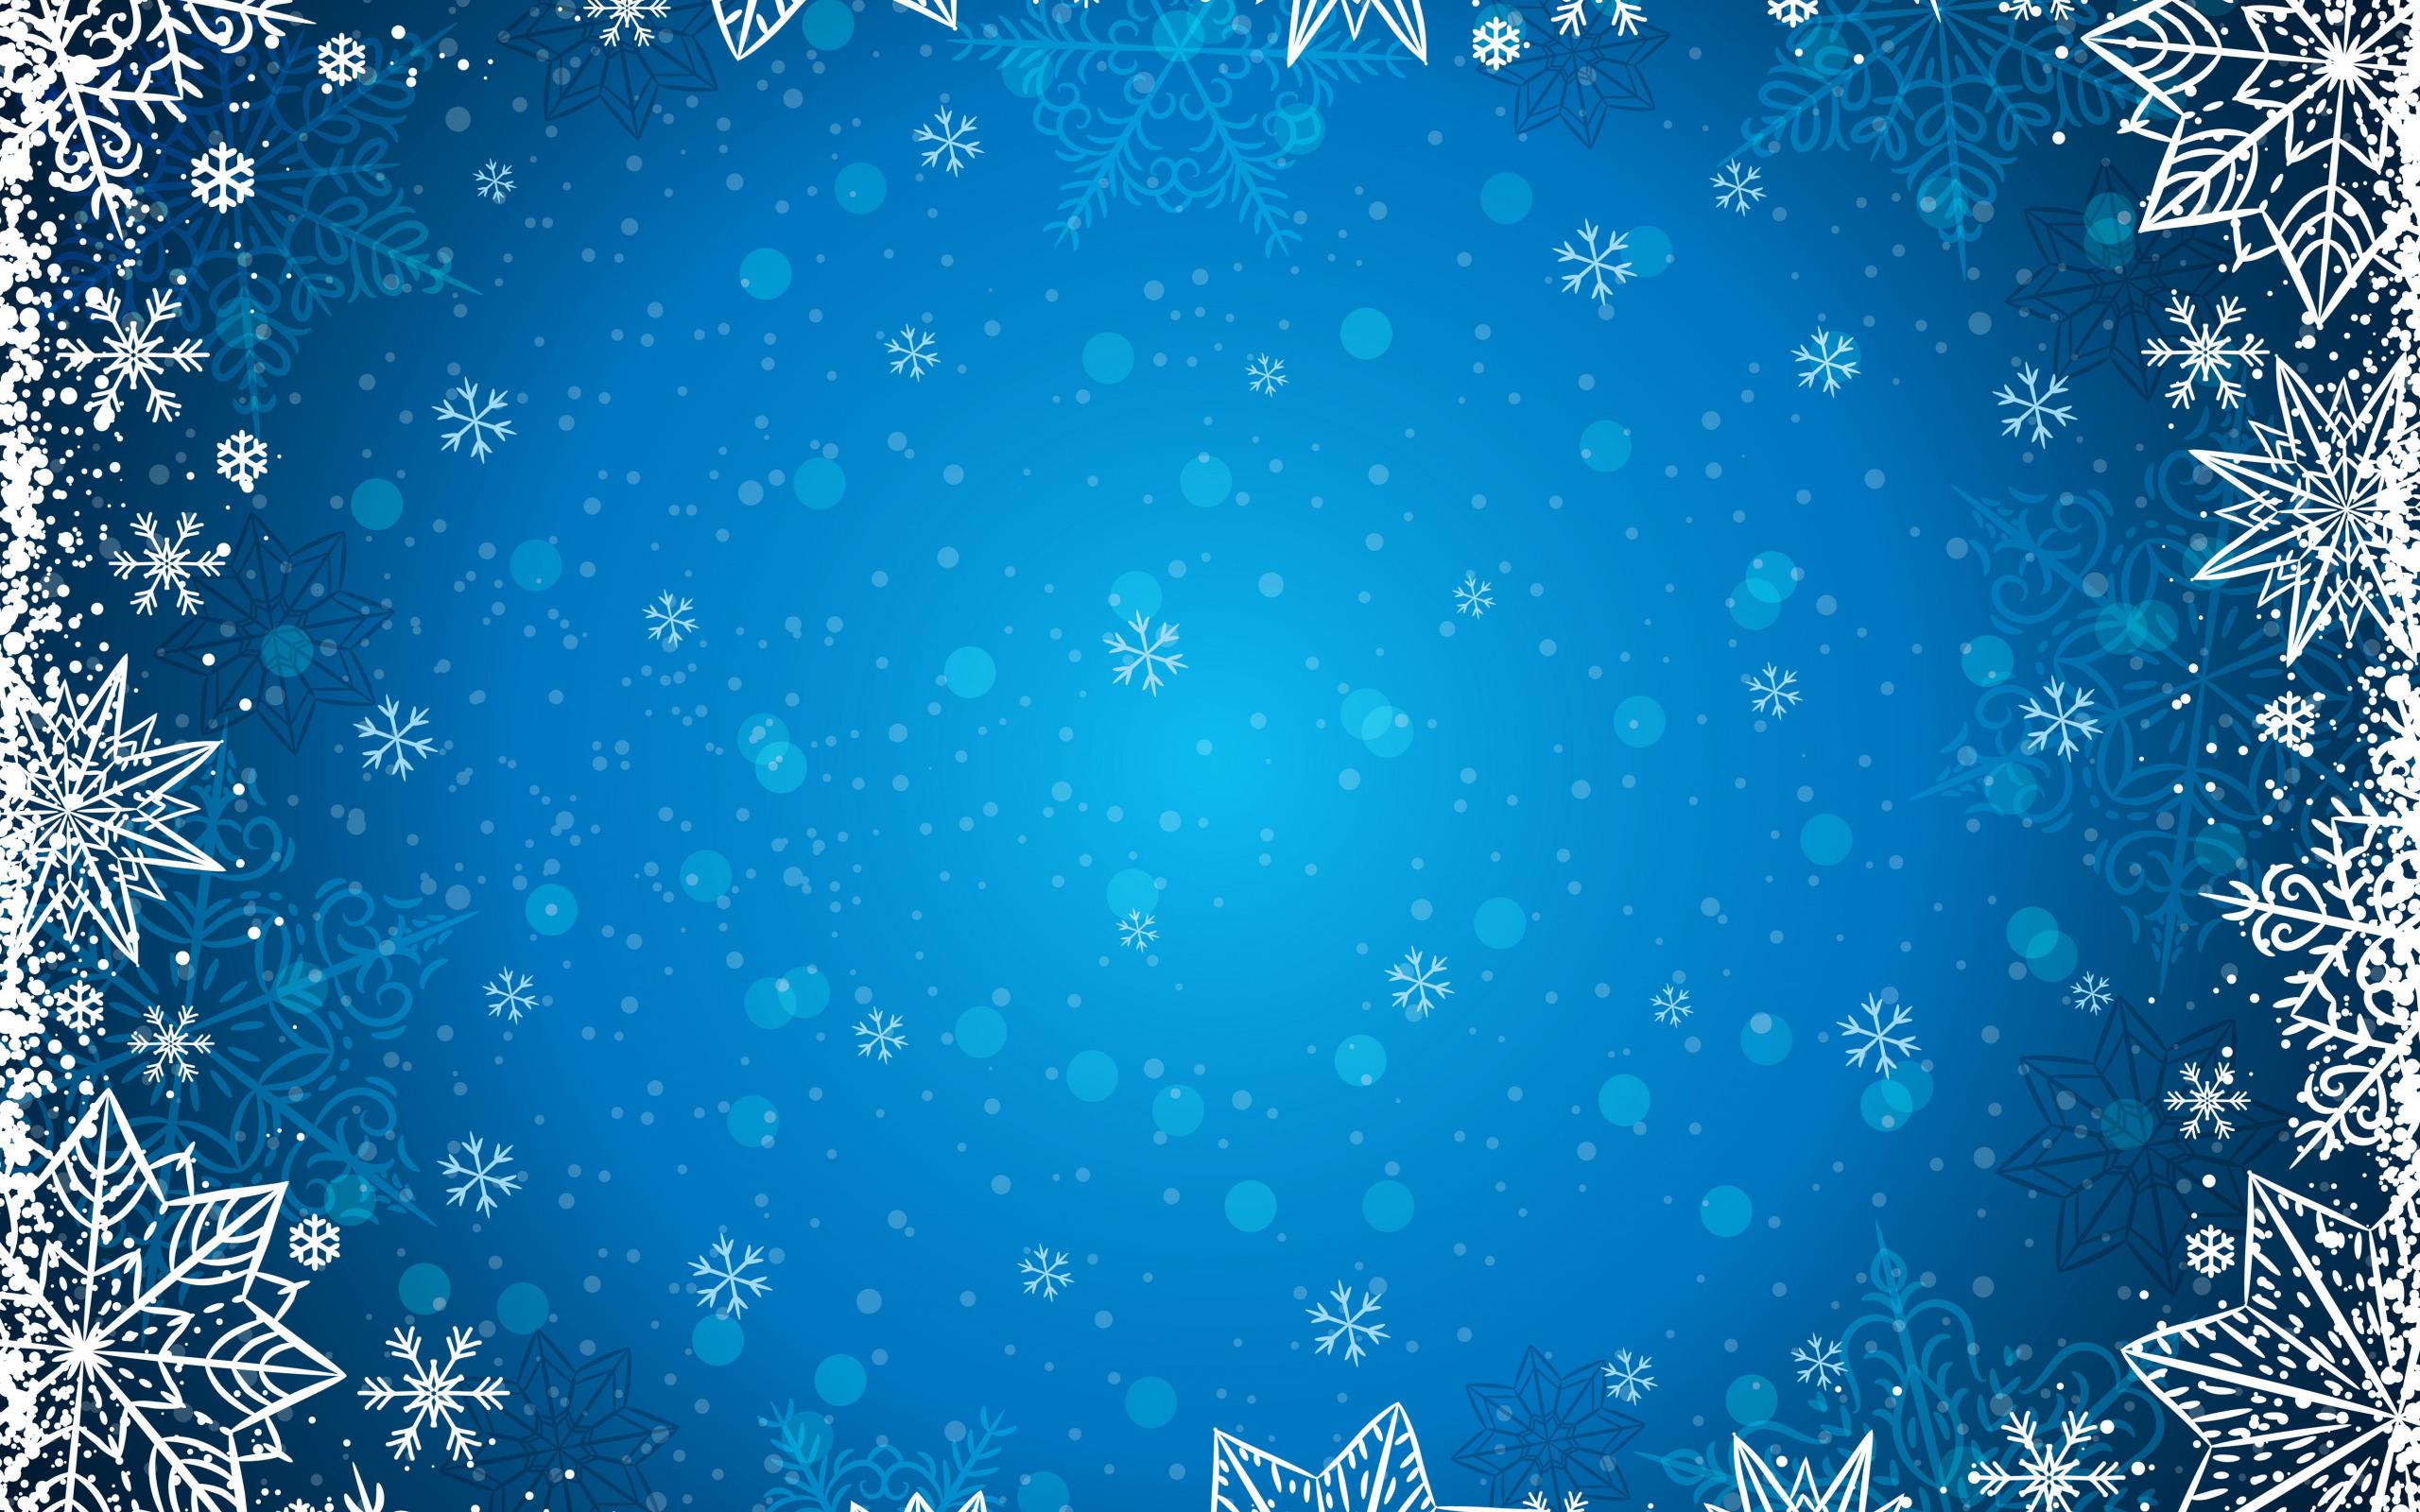 фон для открытки зимний синий внимание